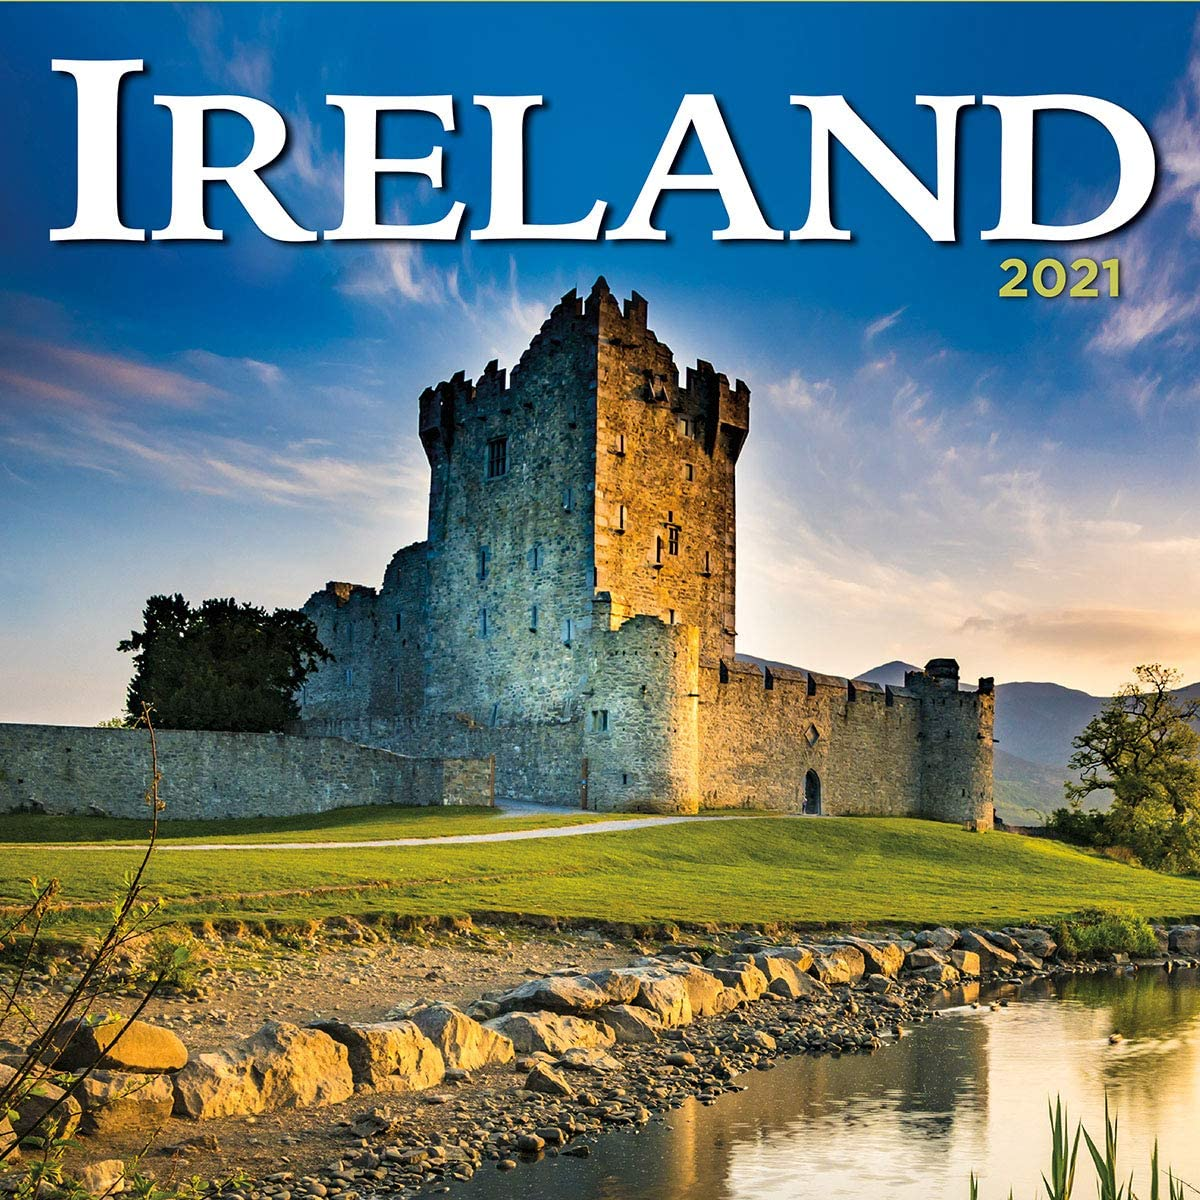 Turner Photo Ireland 2021 Photo Wall Calendar (21998940029), 12 inch x 24 inch